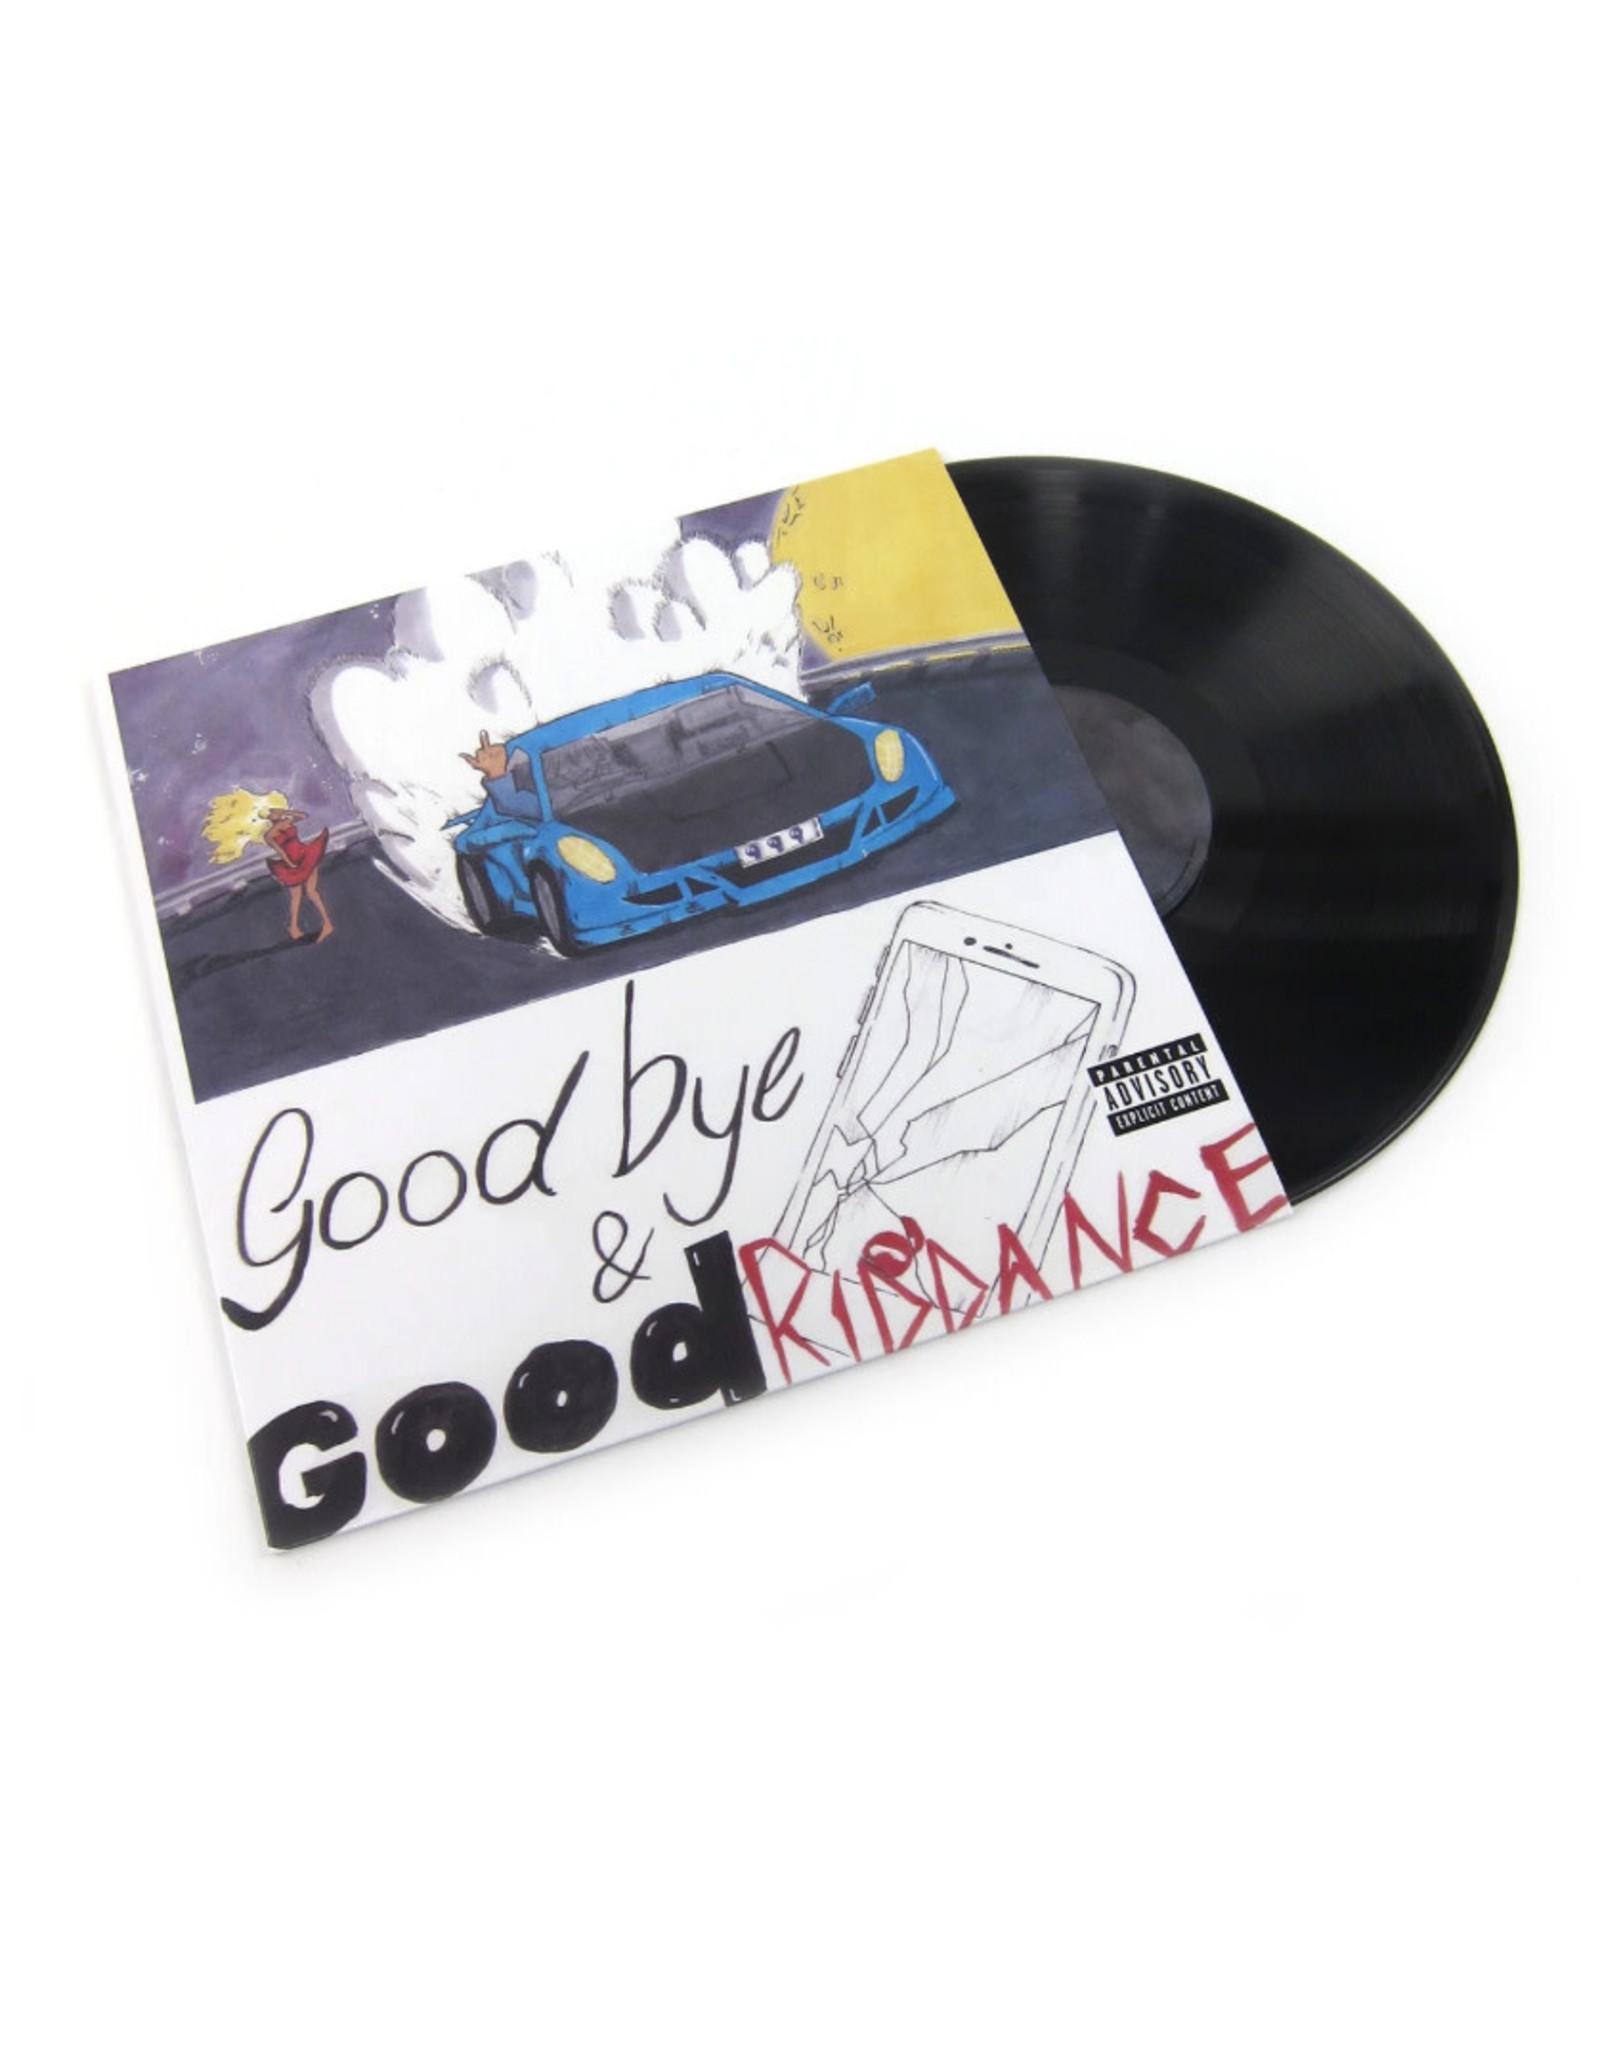 Juice Wrld - Goodbye & Good Riddance LP